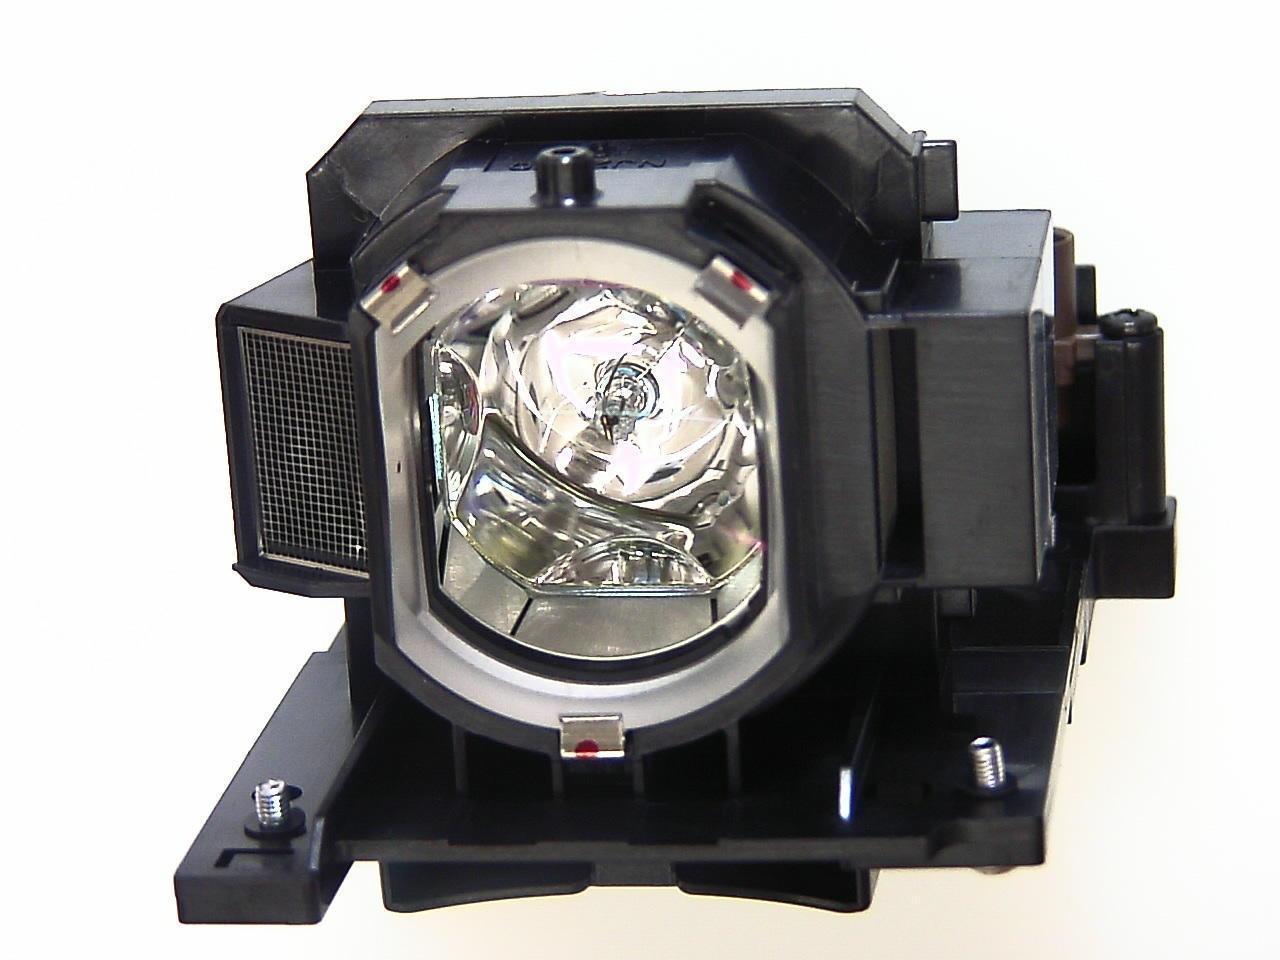 Hitachi DT01121 210W UHB projector lamp